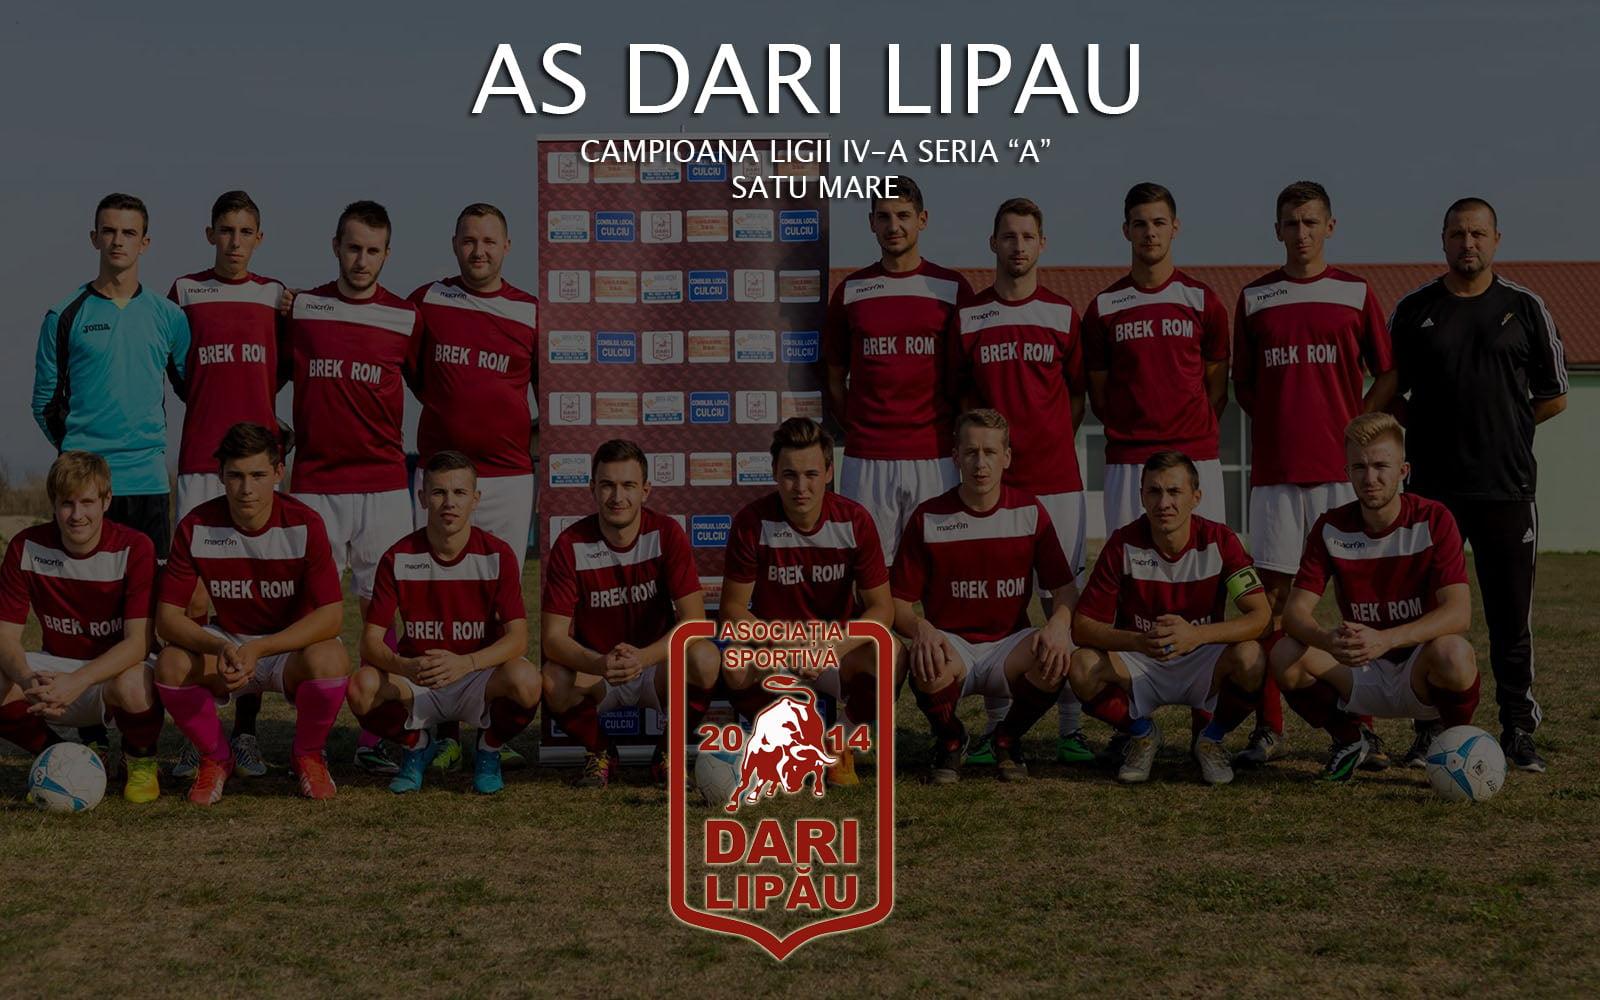 AS Dari Lipău, campioana în liga IV-a seria A din Satu Mare